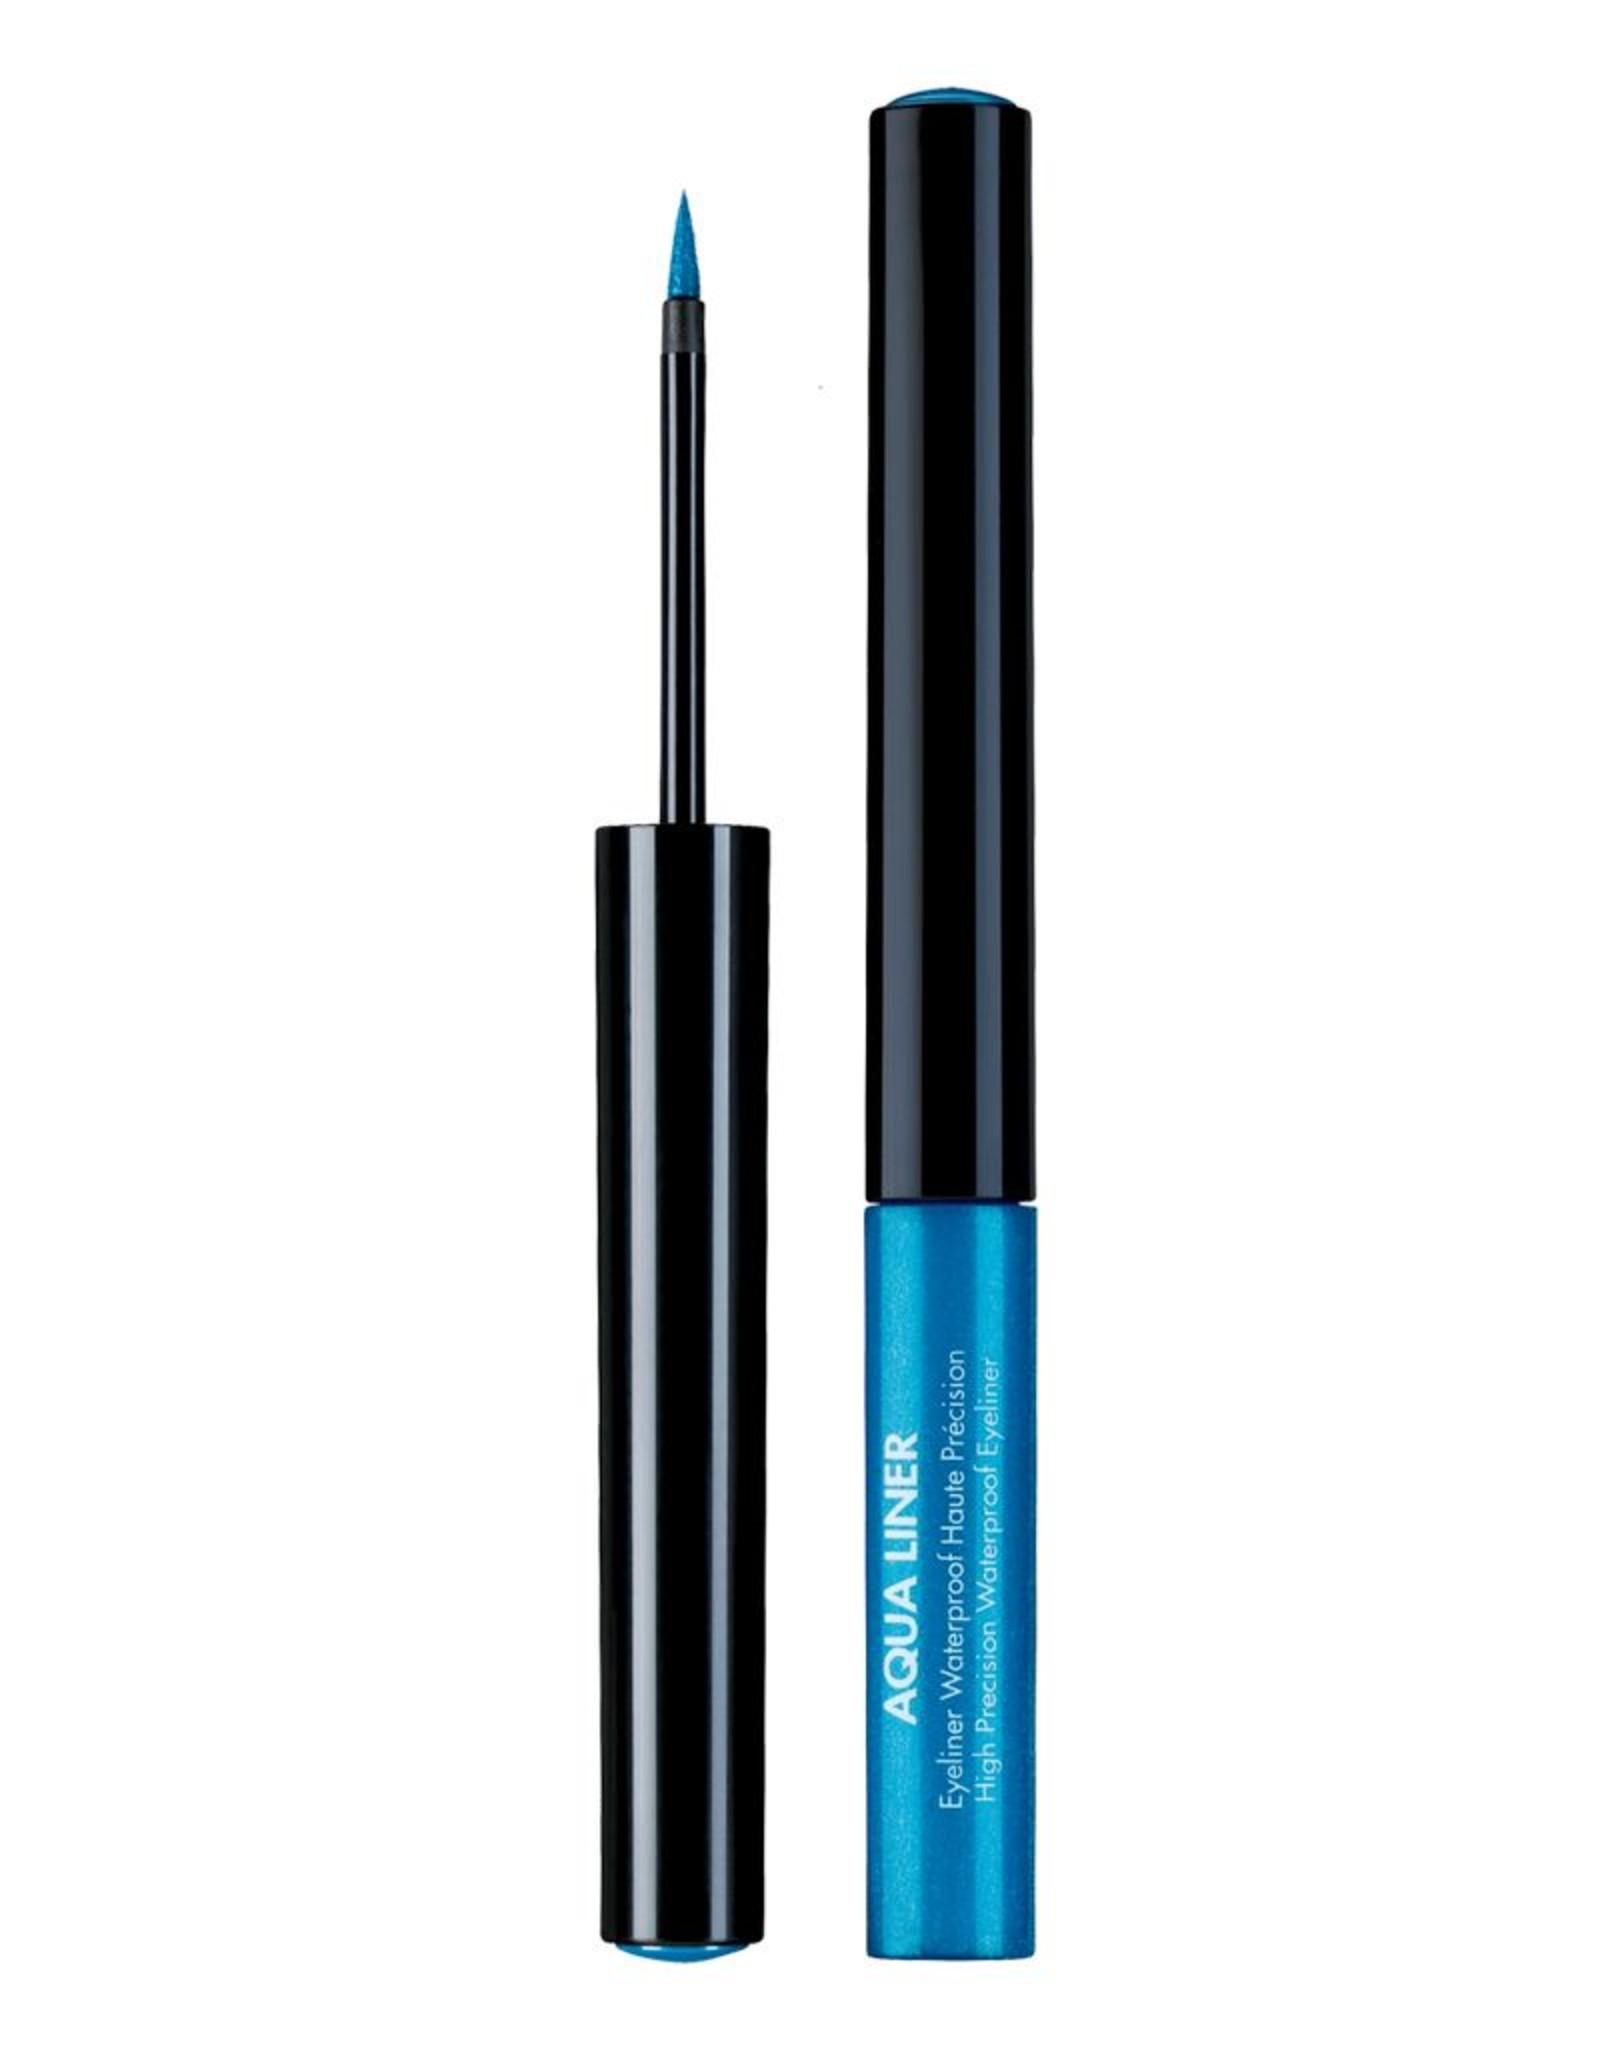 MUFE AQUALINER  1,7ml WPFN5 Bleu Turquoise Diamant /Diamond Turquoise Blue